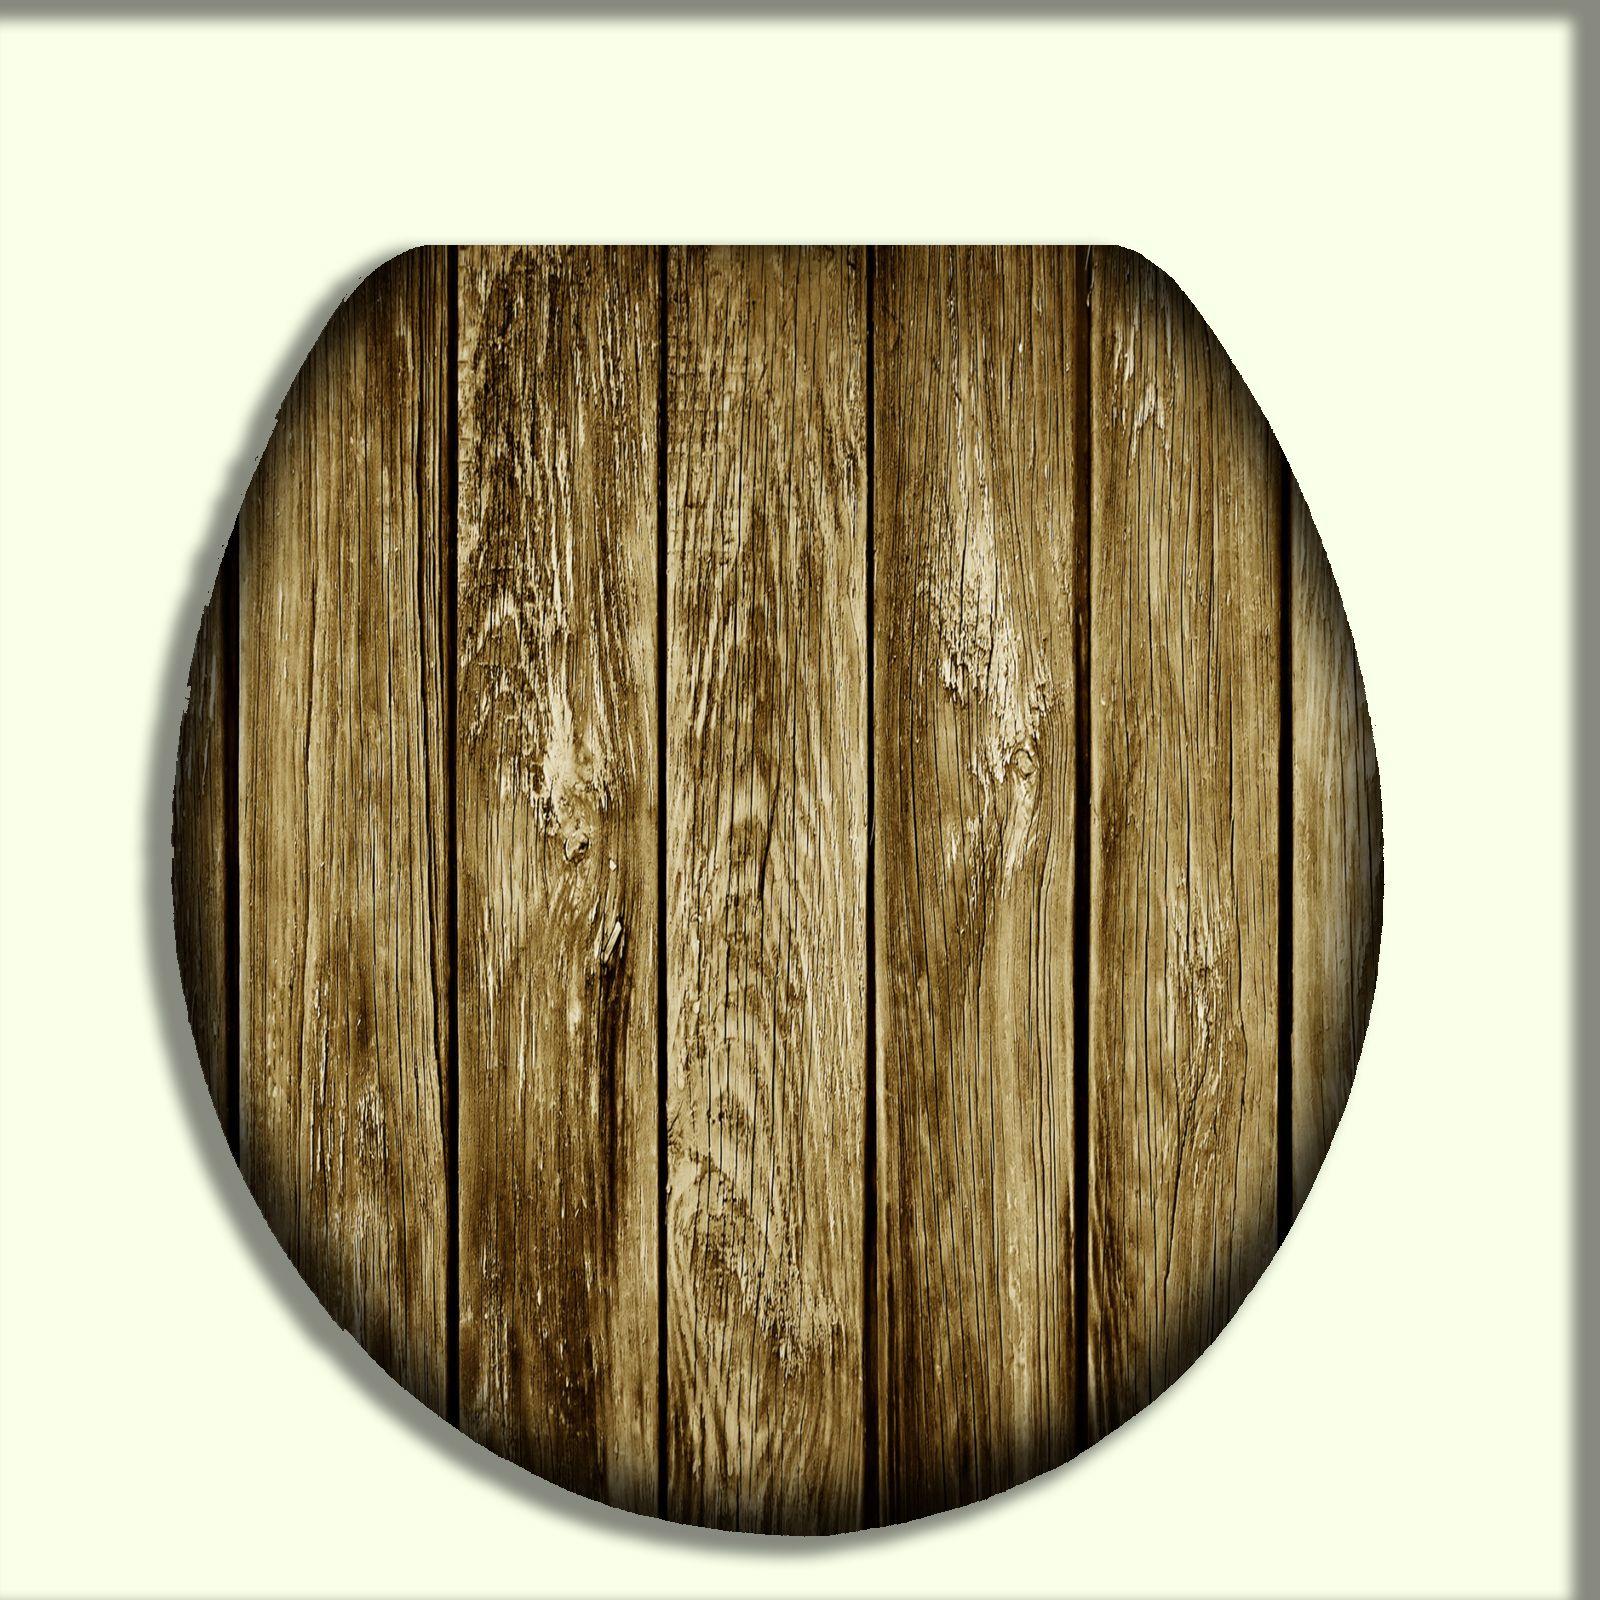 Pleasing Toilet Seat With Rustic Brownish Grey Reclaimed Wood Design Uwap Interior Chair Design Uwaporg